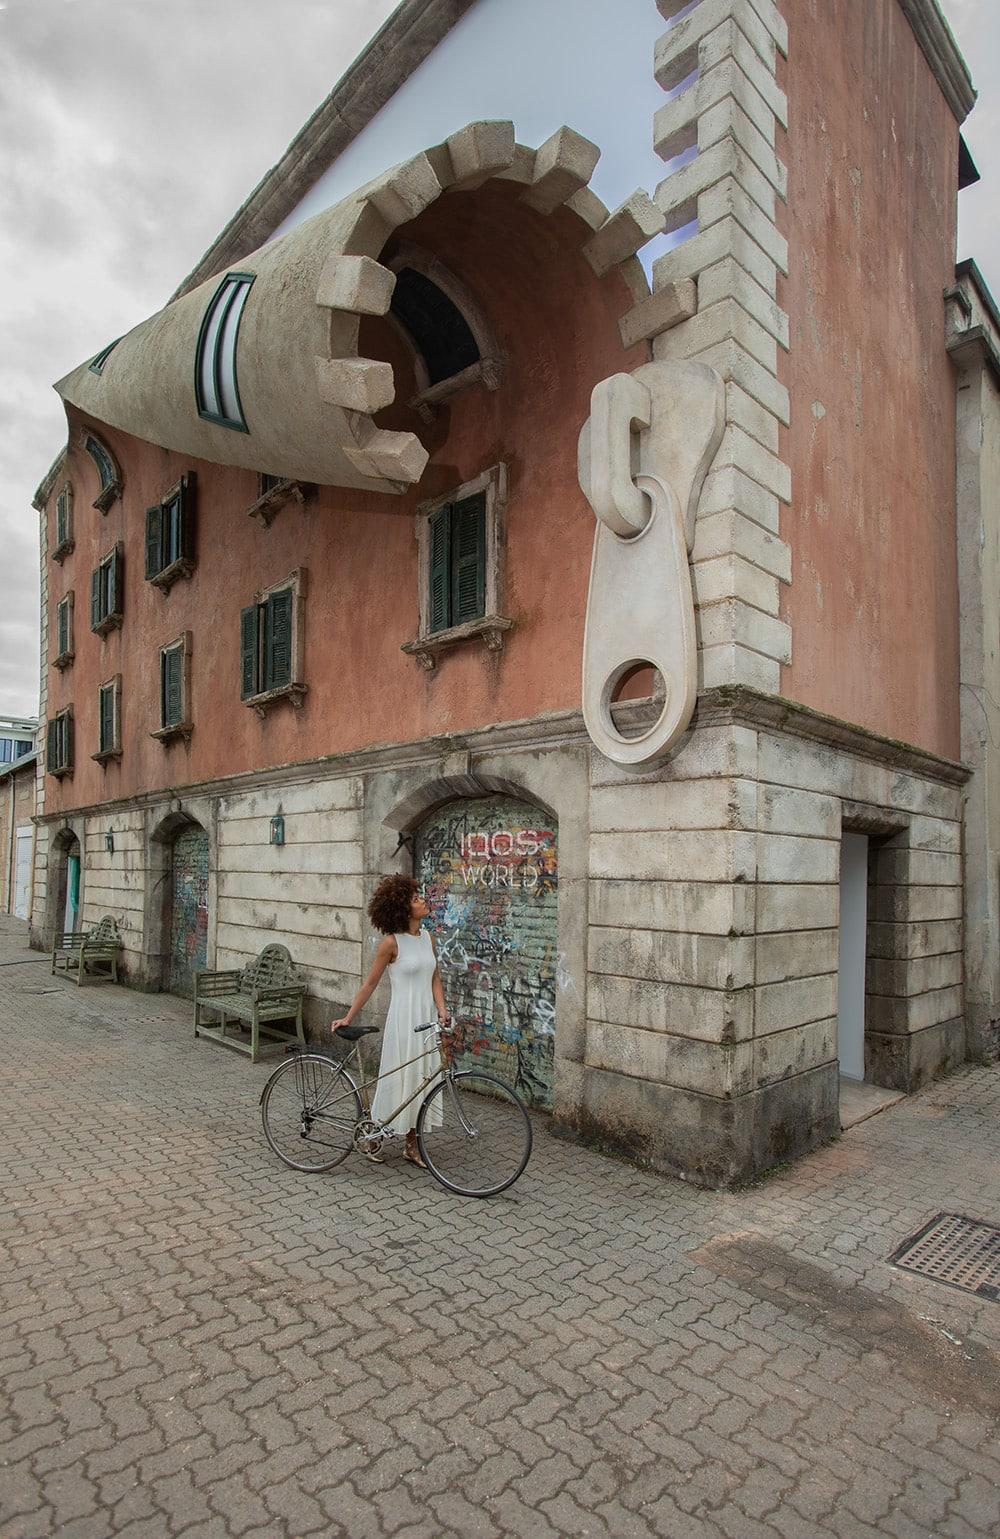 w iqos world revealed by alex chinneck a3 - 10 работ британского скульптора, у которого руки так и чешутся побаловаться с гравитацией